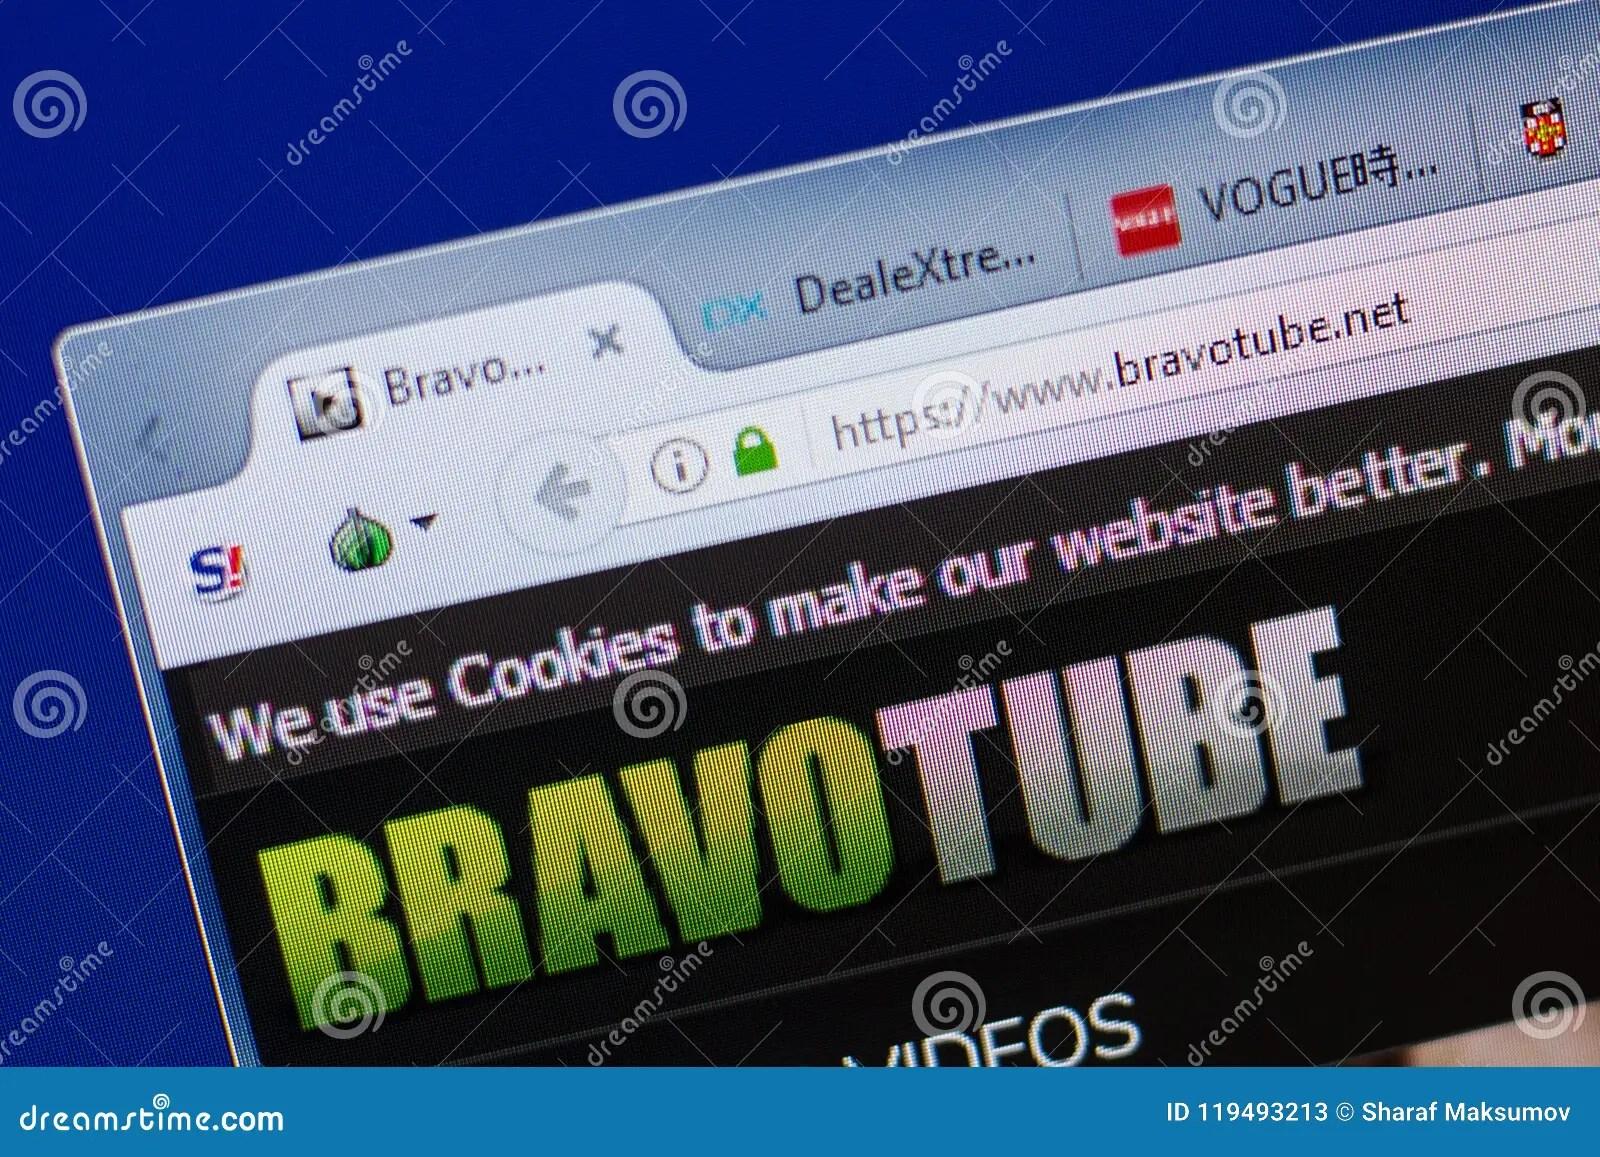 Ryazan Russia June 17 2018 Homepage Of Bravotube Website On The Display Of Pc Url Bravotube Net